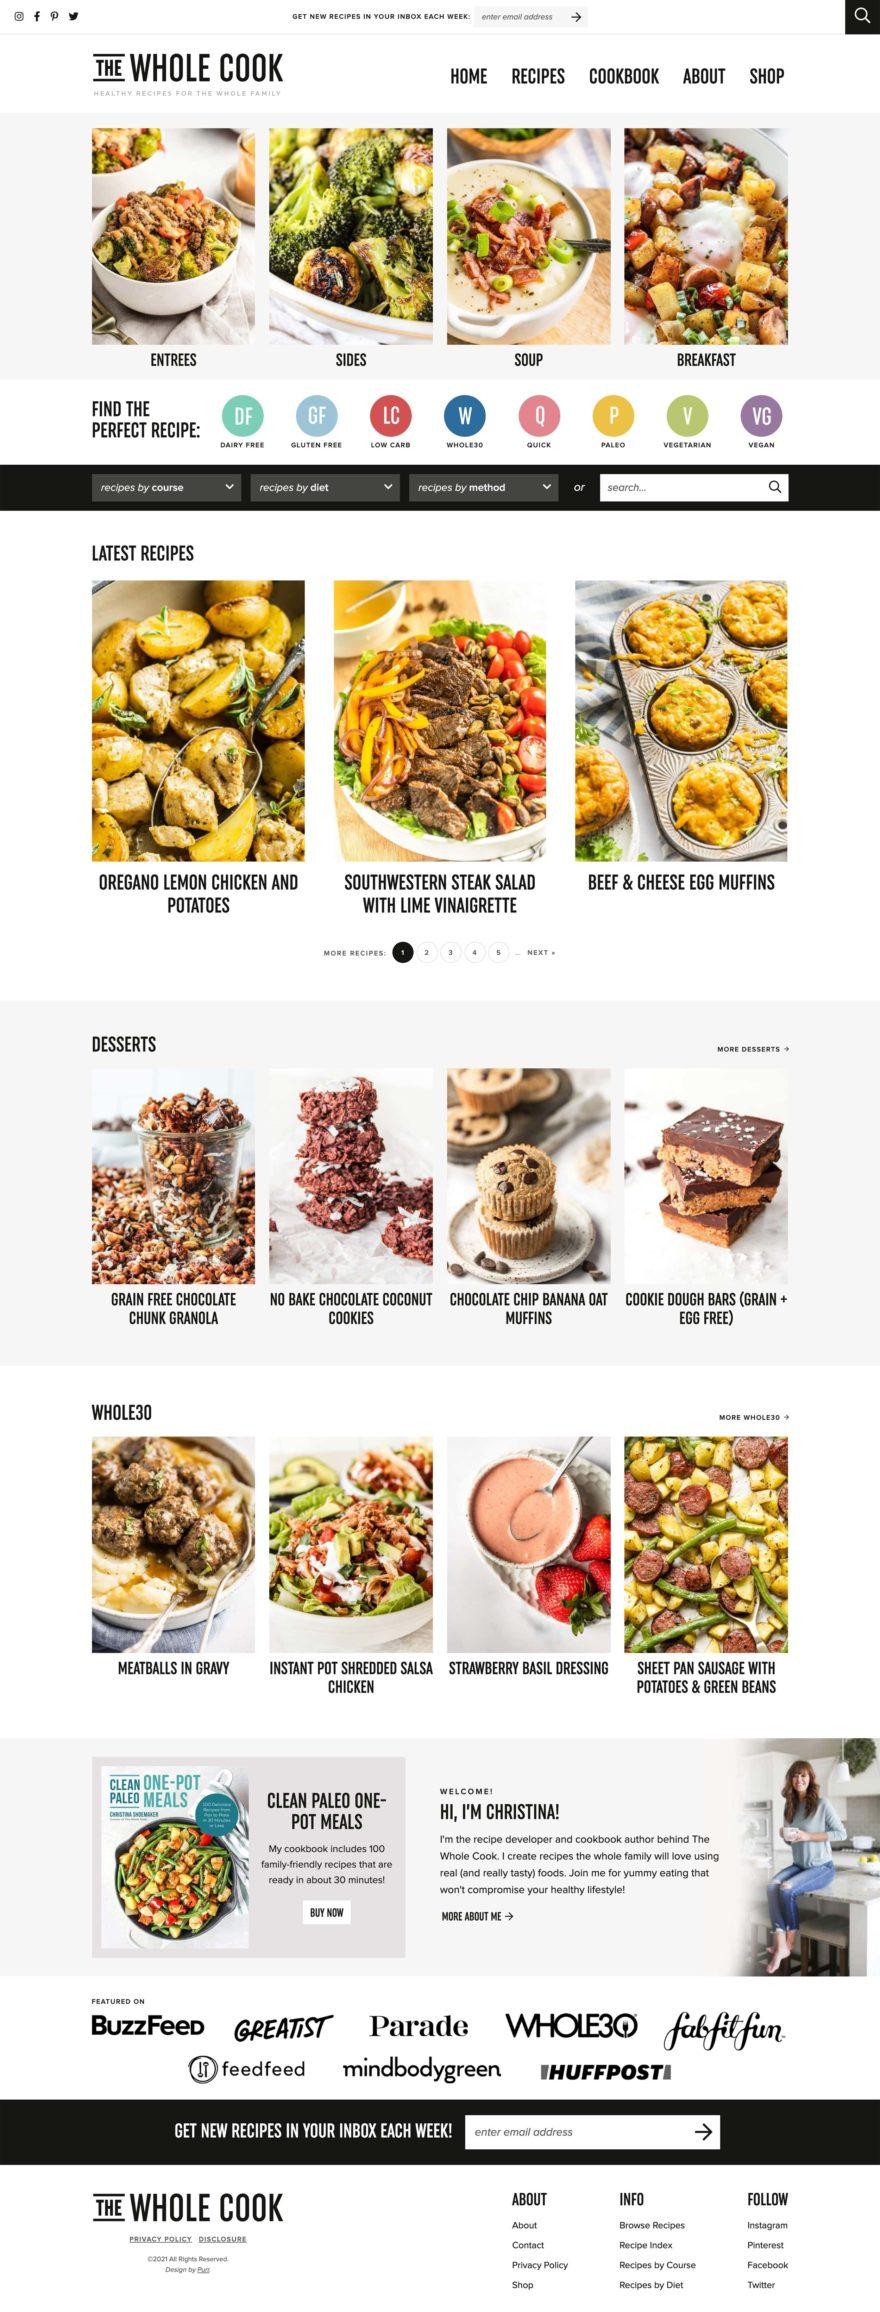 The Whole Cook full homepage screenshot